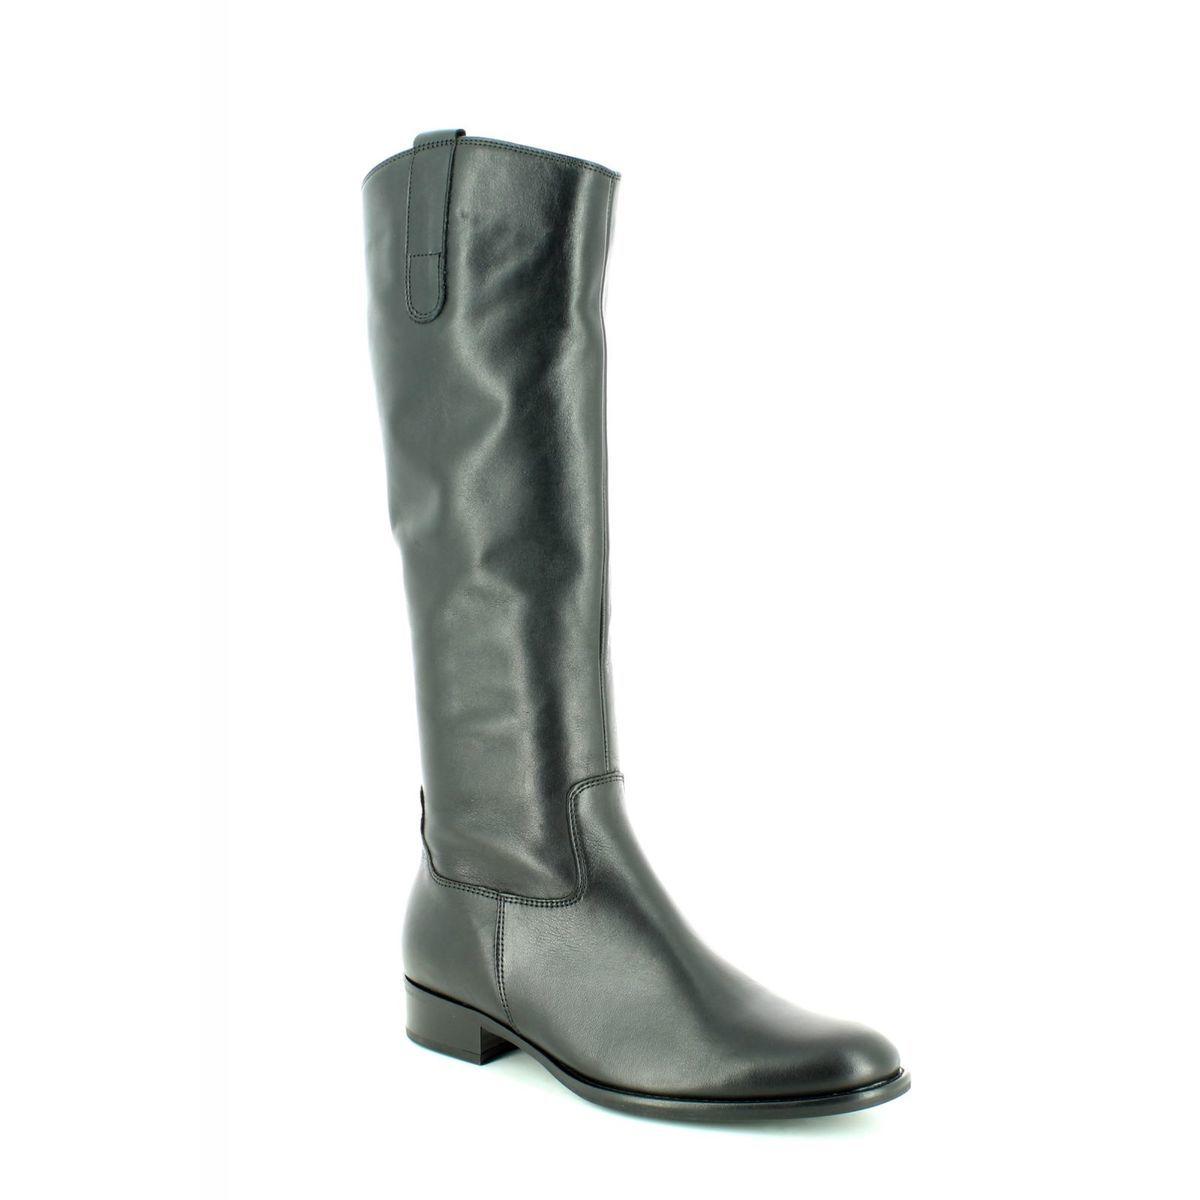 Spitzenstil marktfähig große Auswahl an Farben 91.648.27 Brook Slim Leg at Begg Shoes & Bags